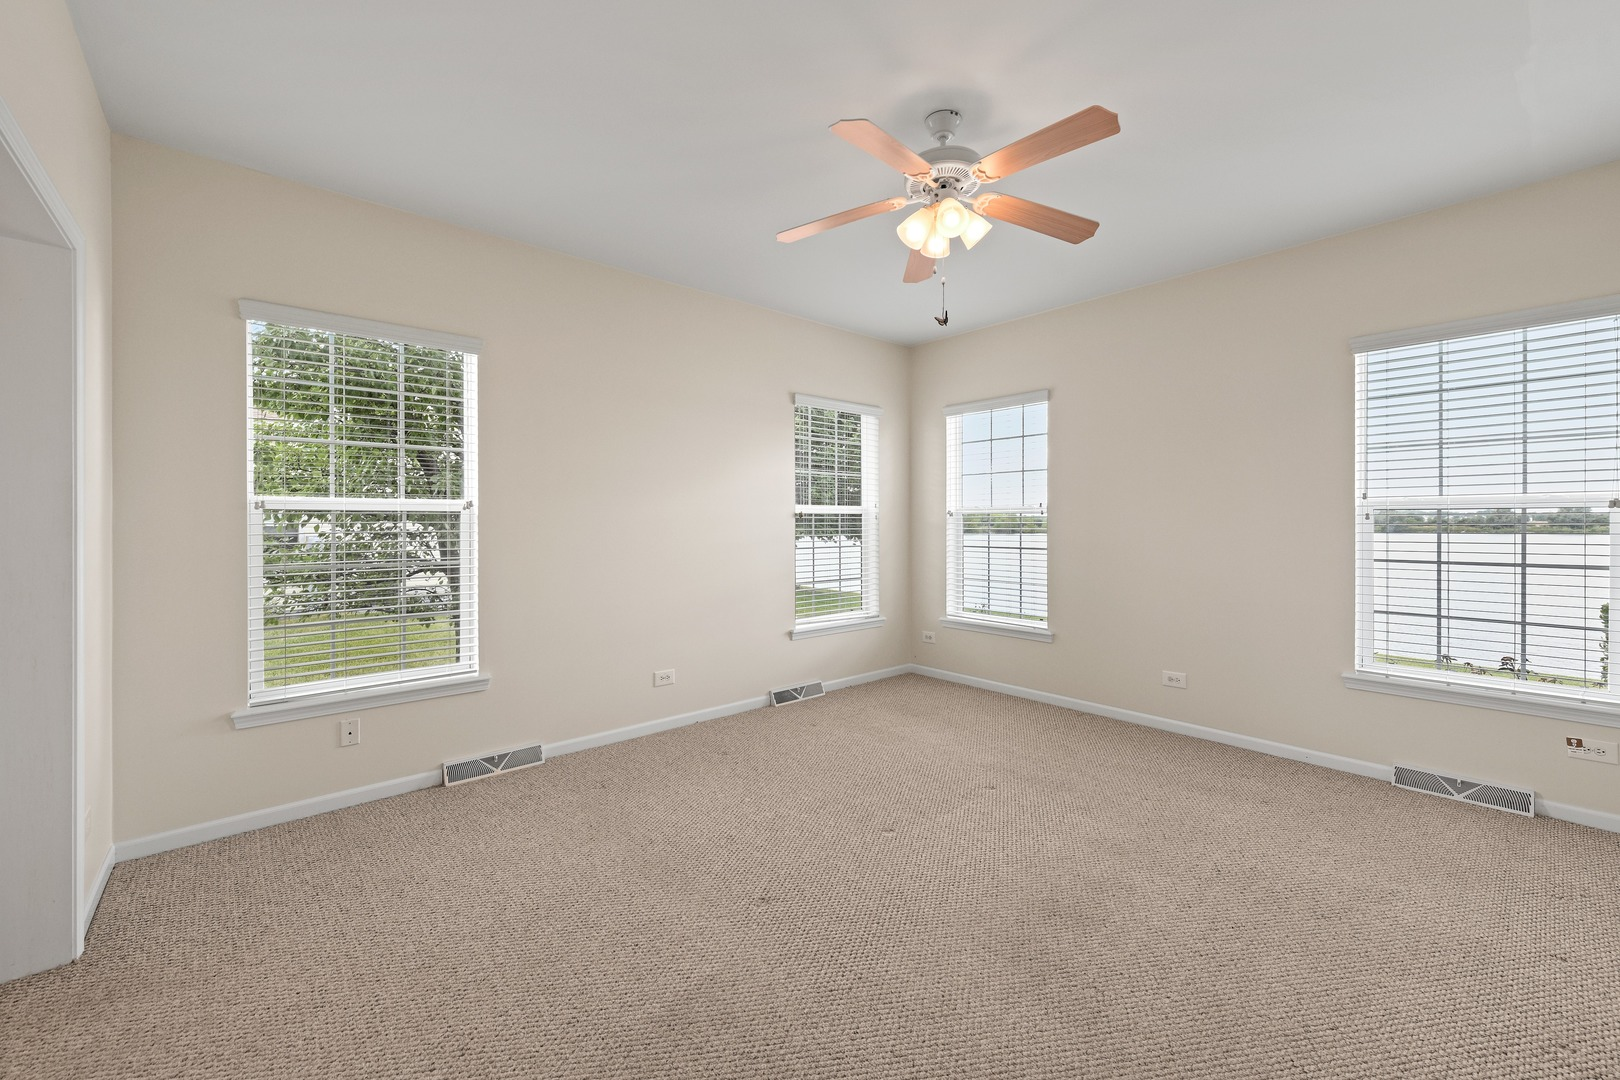 2208 Morgan, Grayslake, Illinois, 60030